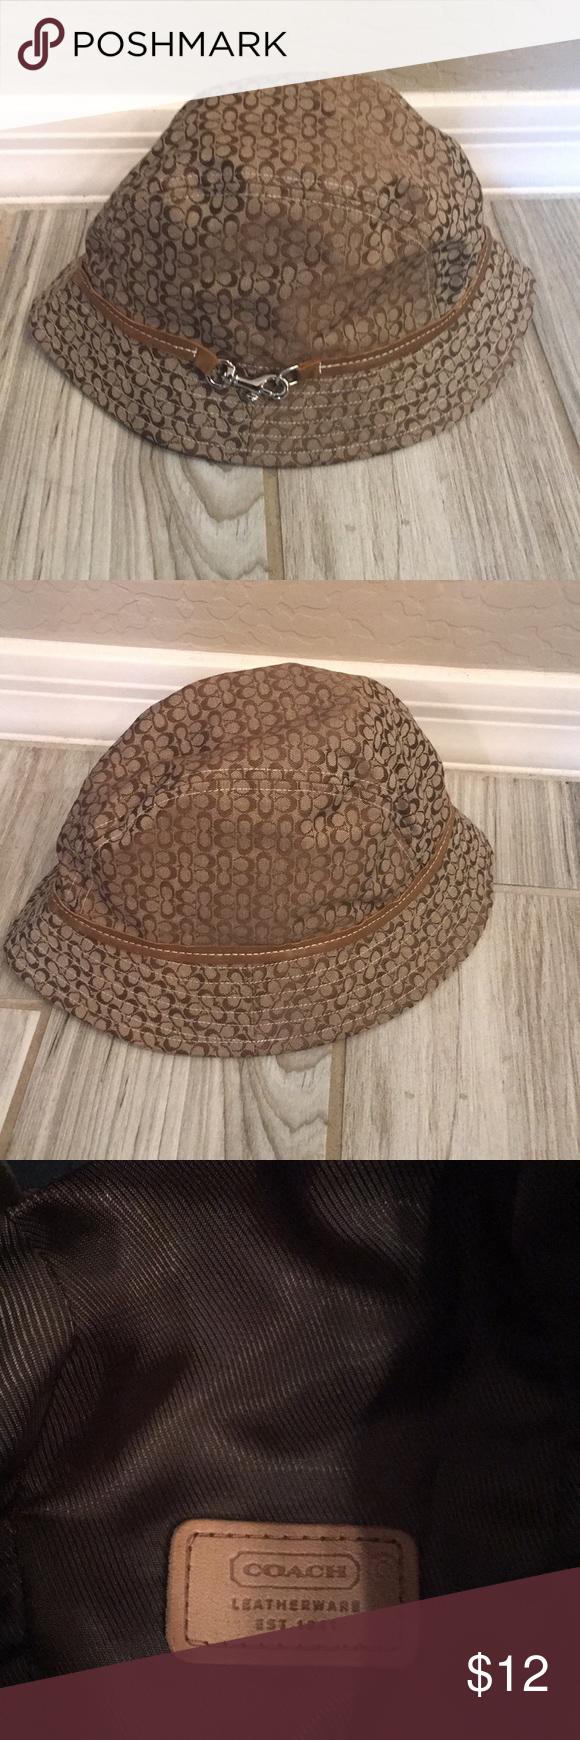 Coach rain hat Signature Coach rain hat with silver accent. Coach  Accessories Hats 14c0cc455c5